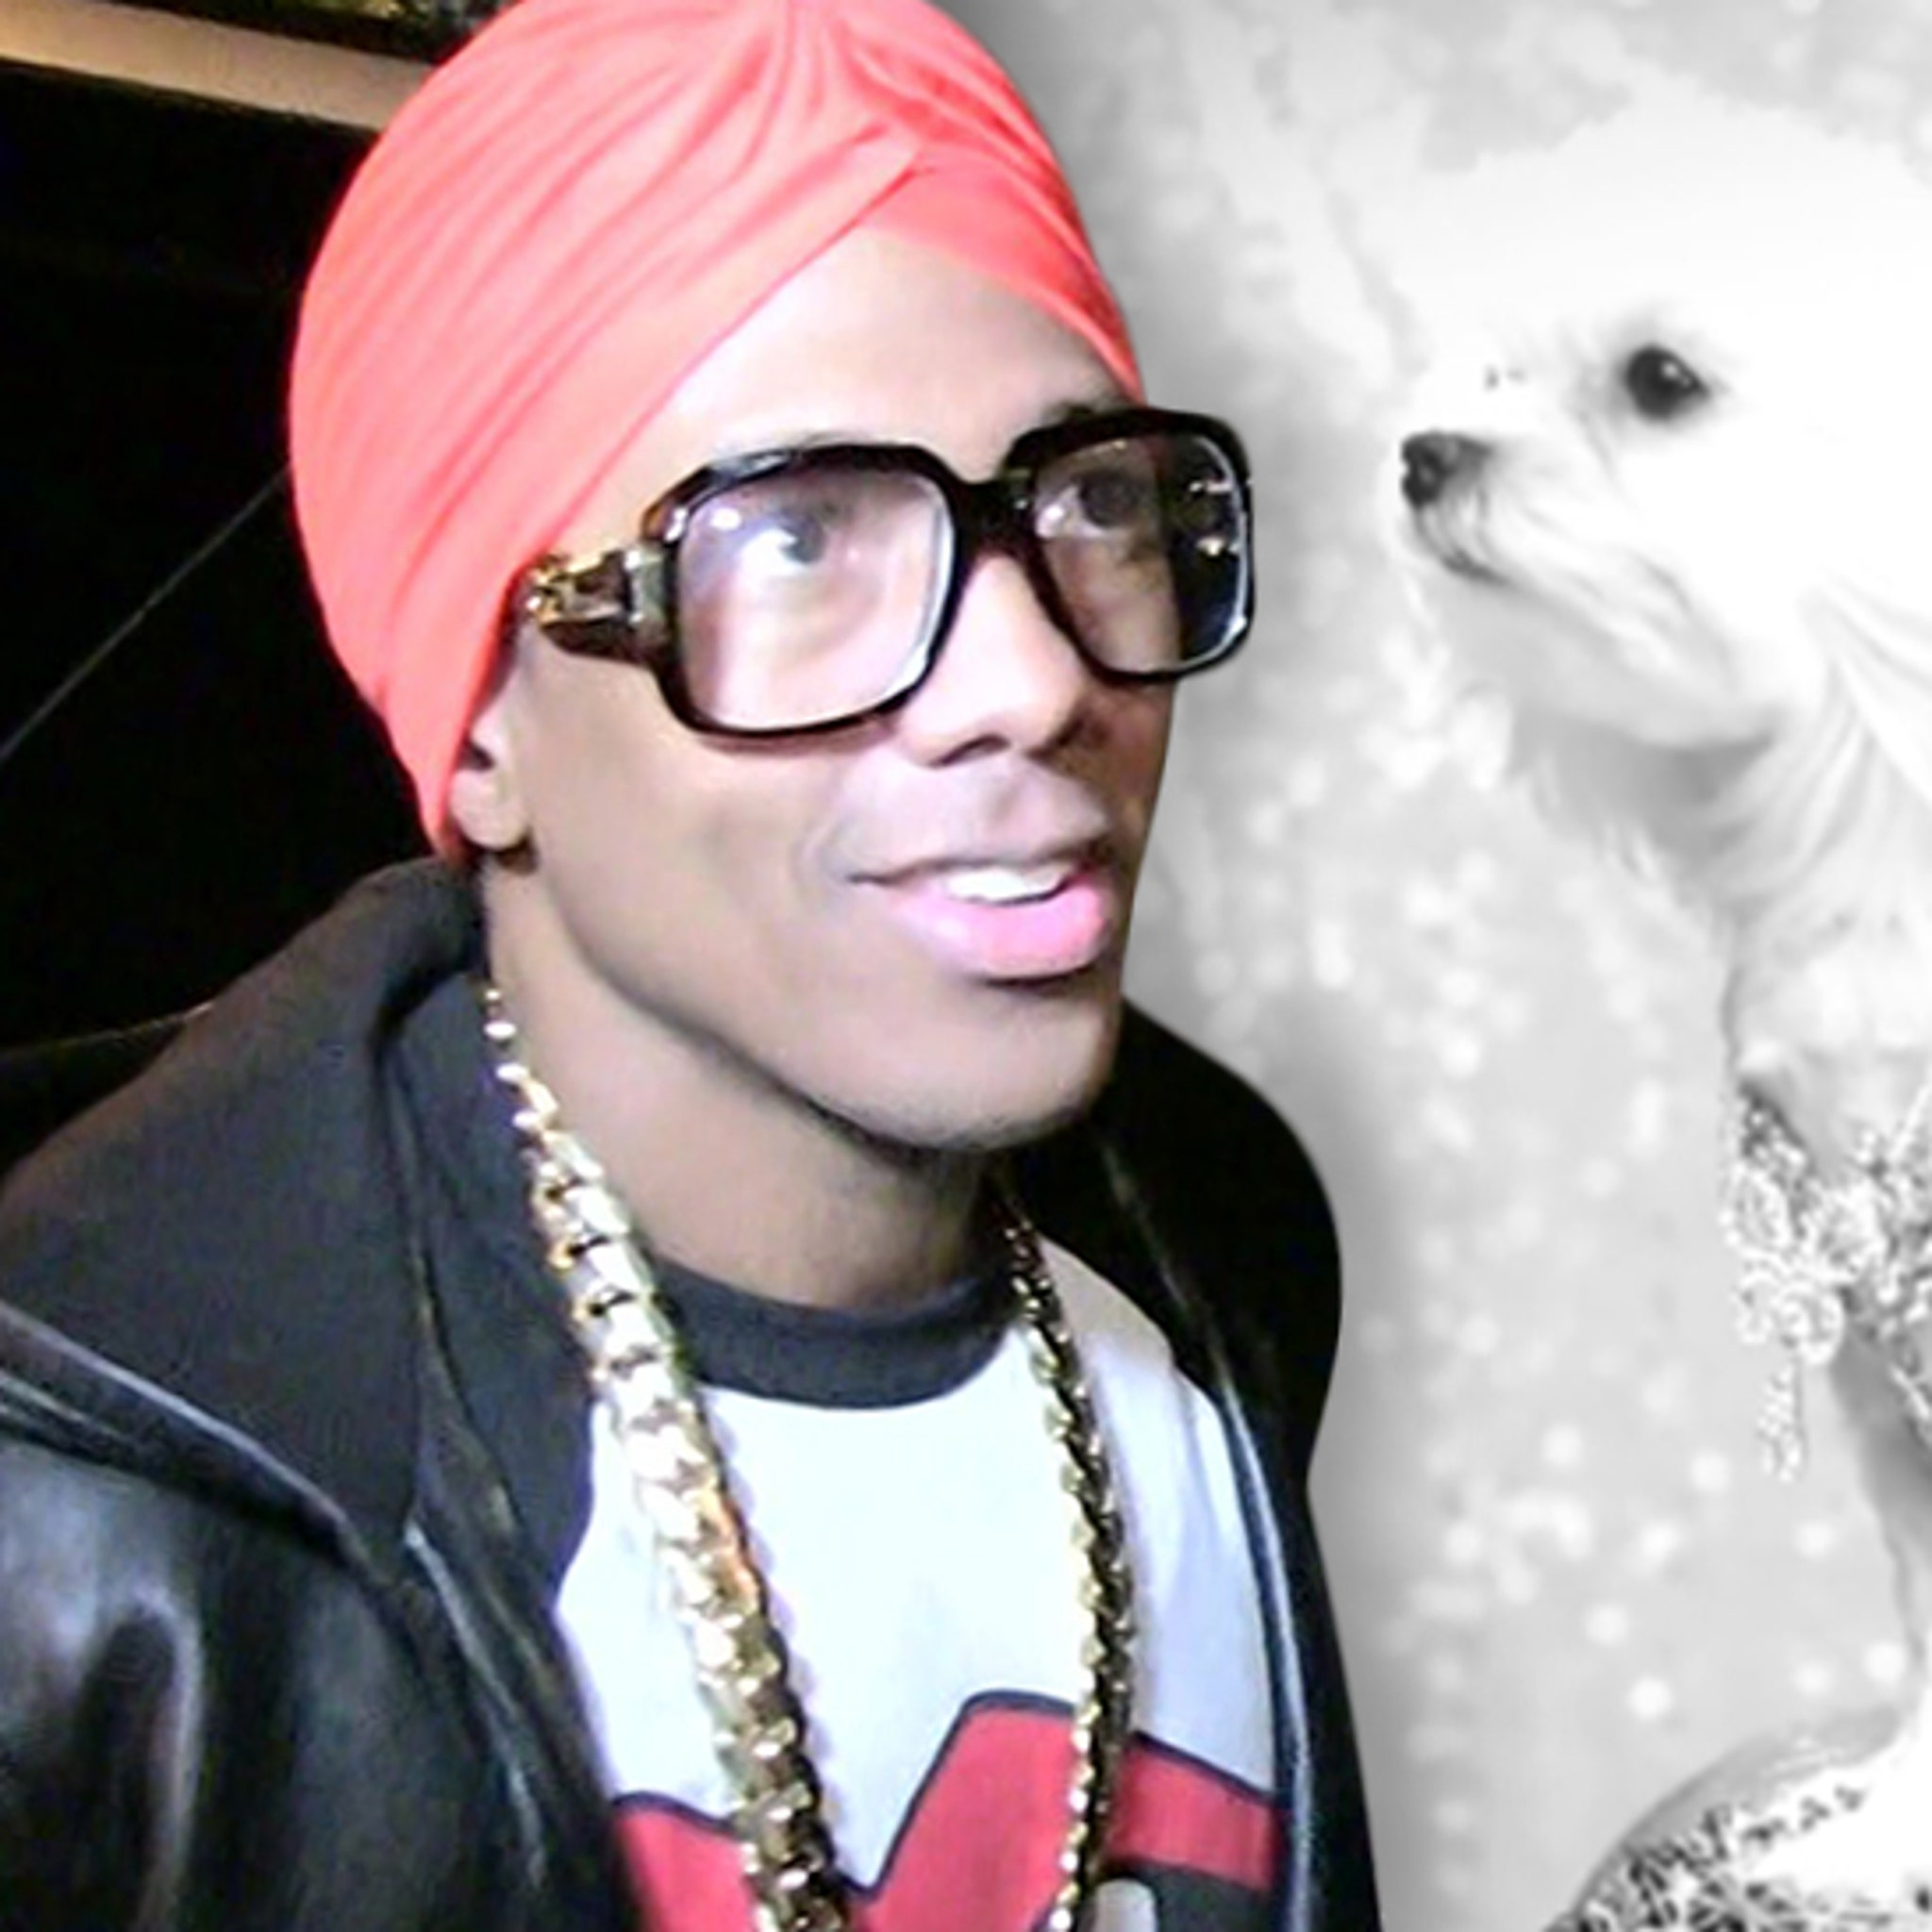 Nick Cannon Cast Mariah Carey's Dog Look-alike In 'Dream